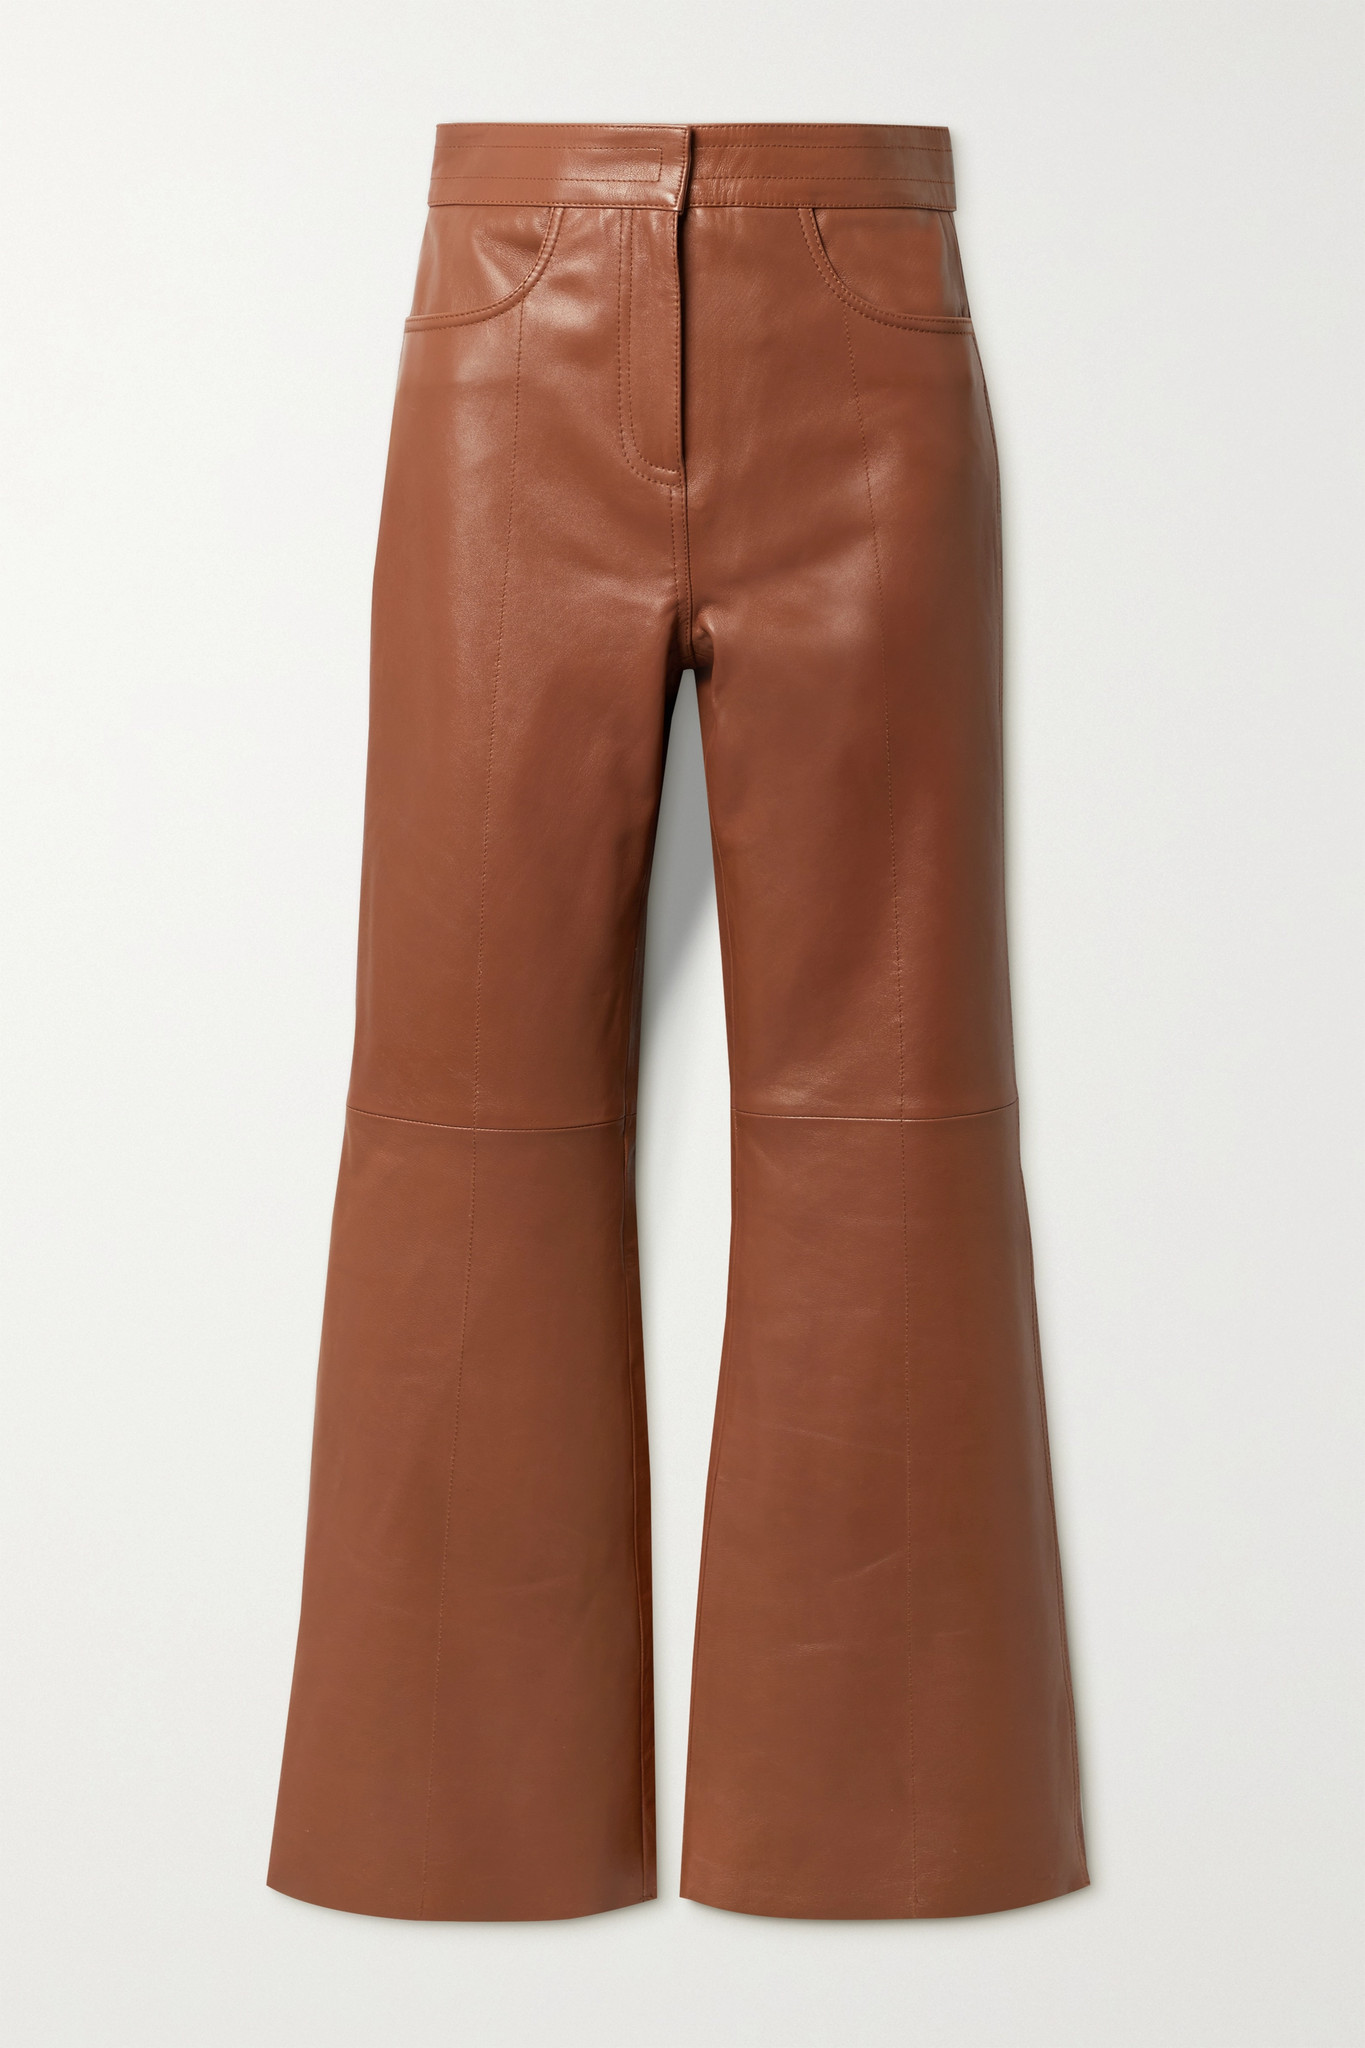 STAND STUDIO - Eudora 皮革喇叭裤 - 棕色 - FR34